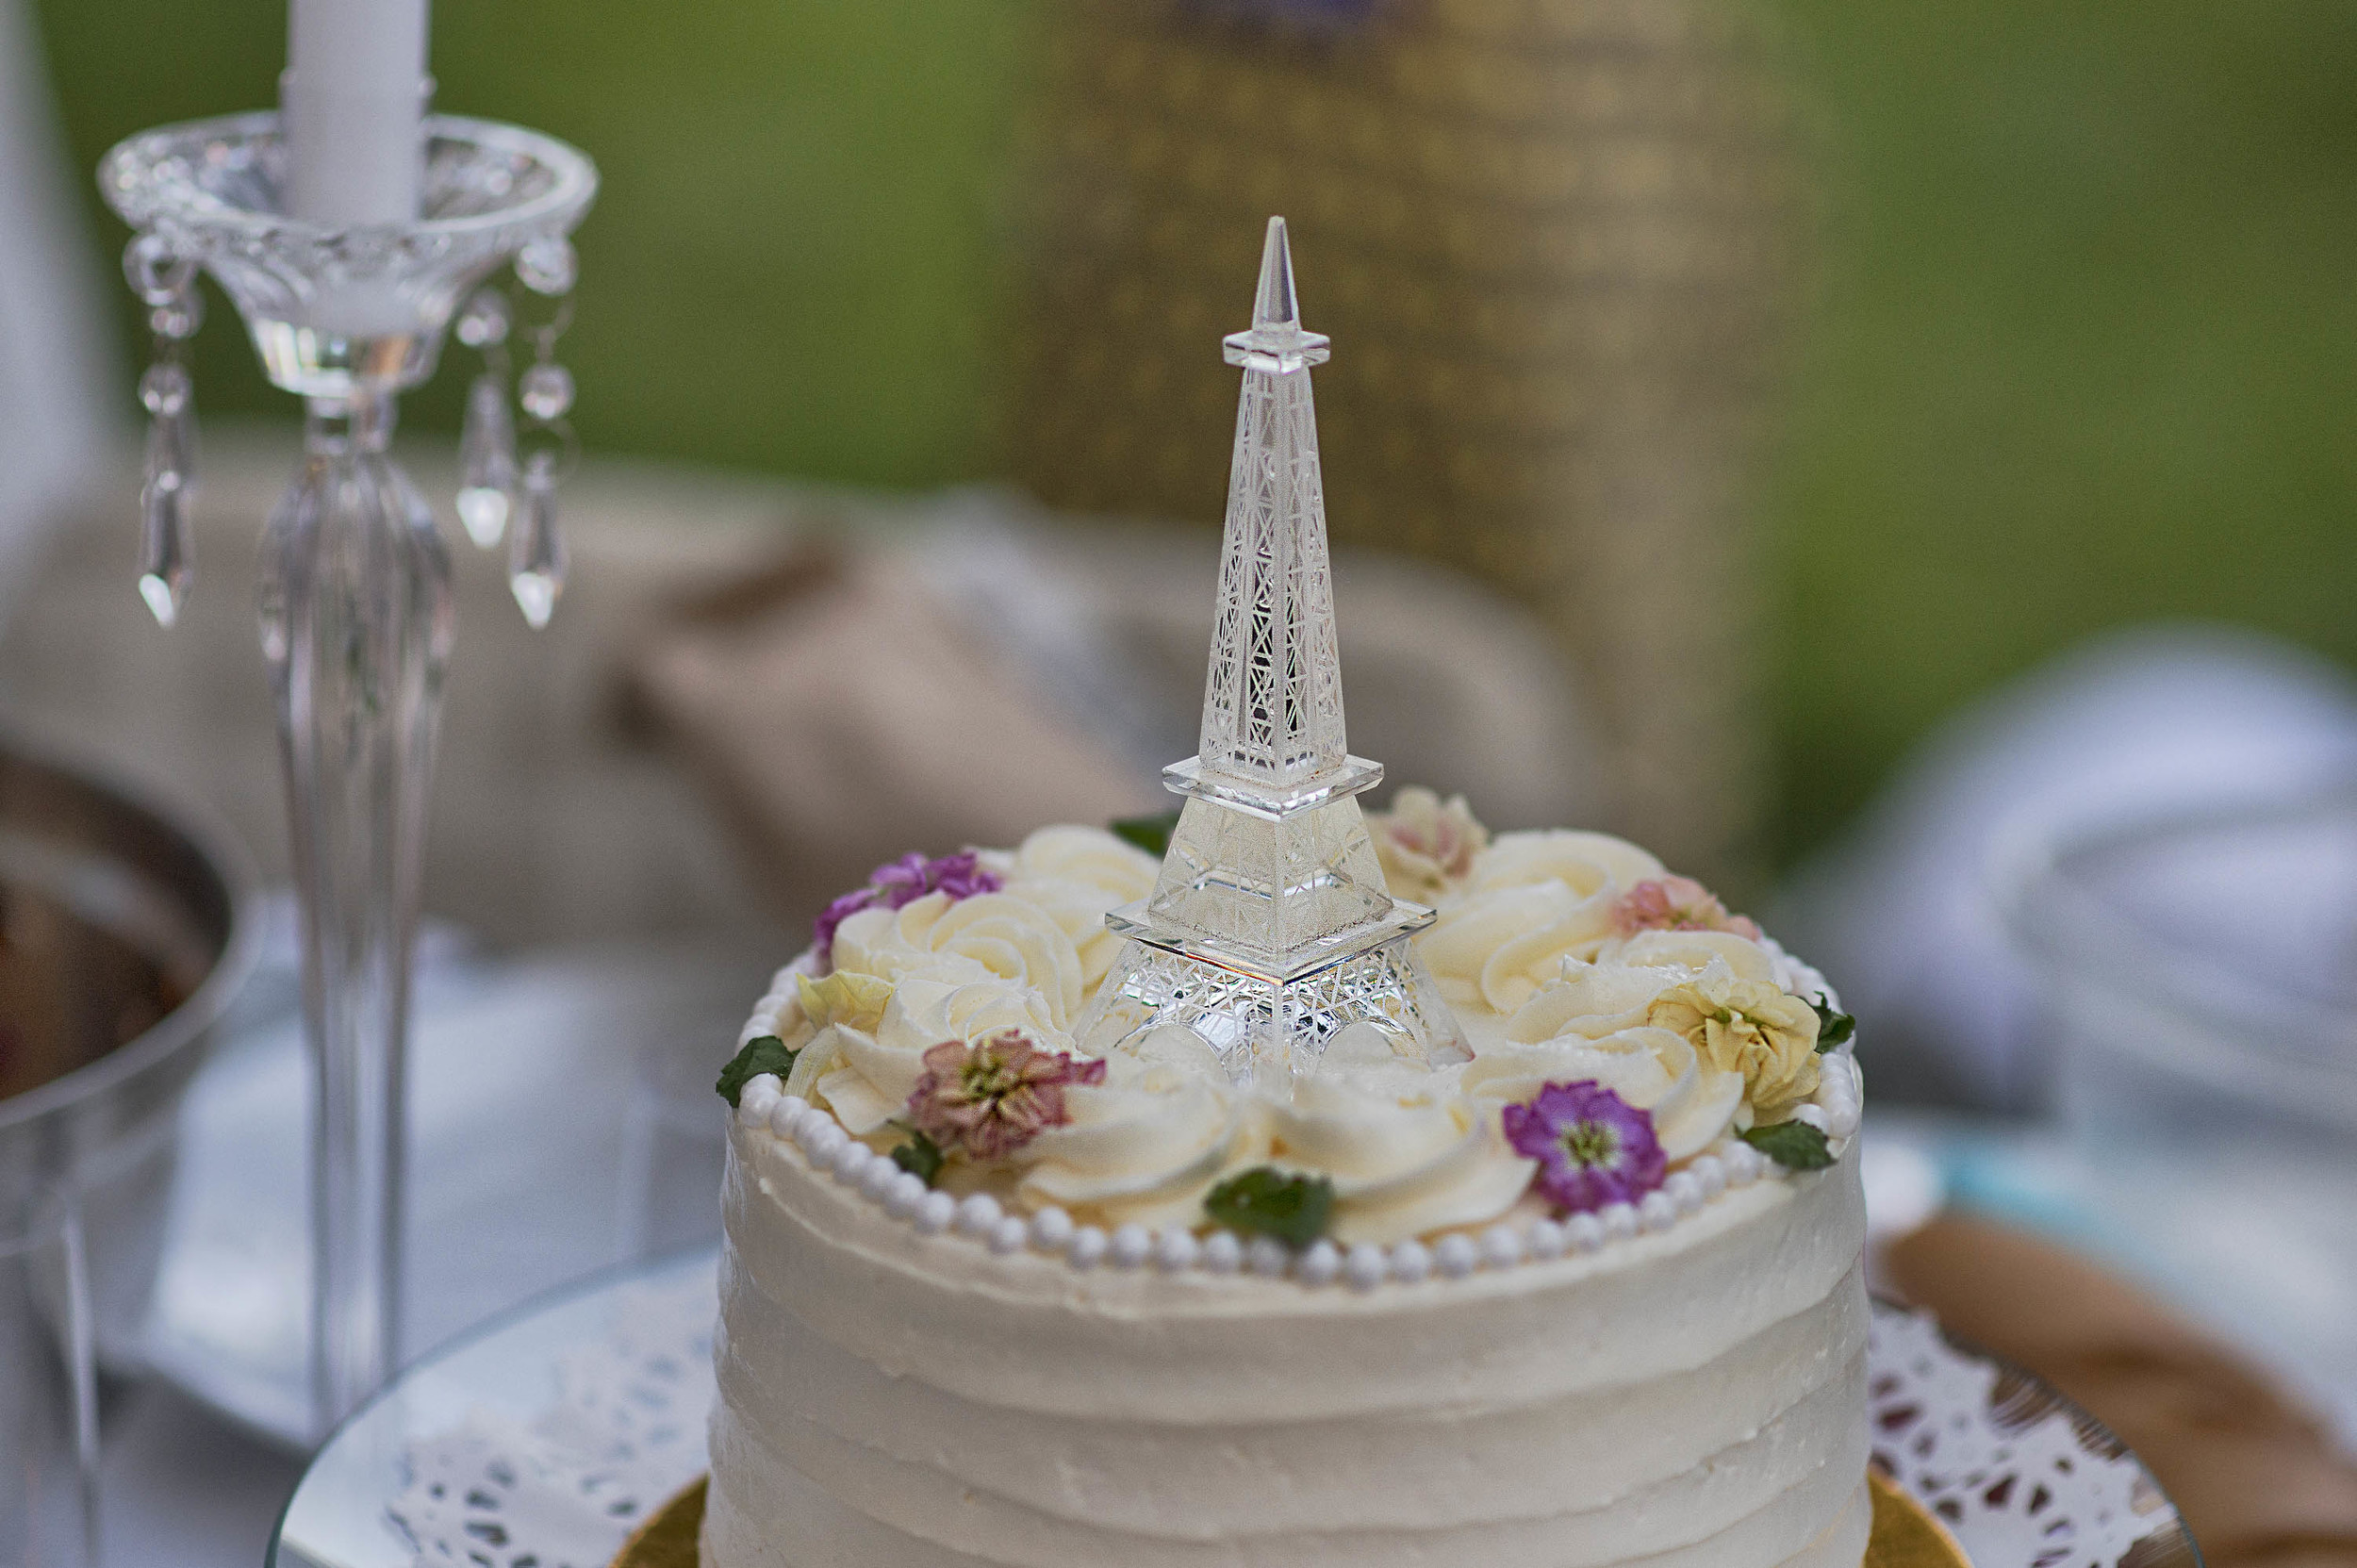 Cake_8134.jpg